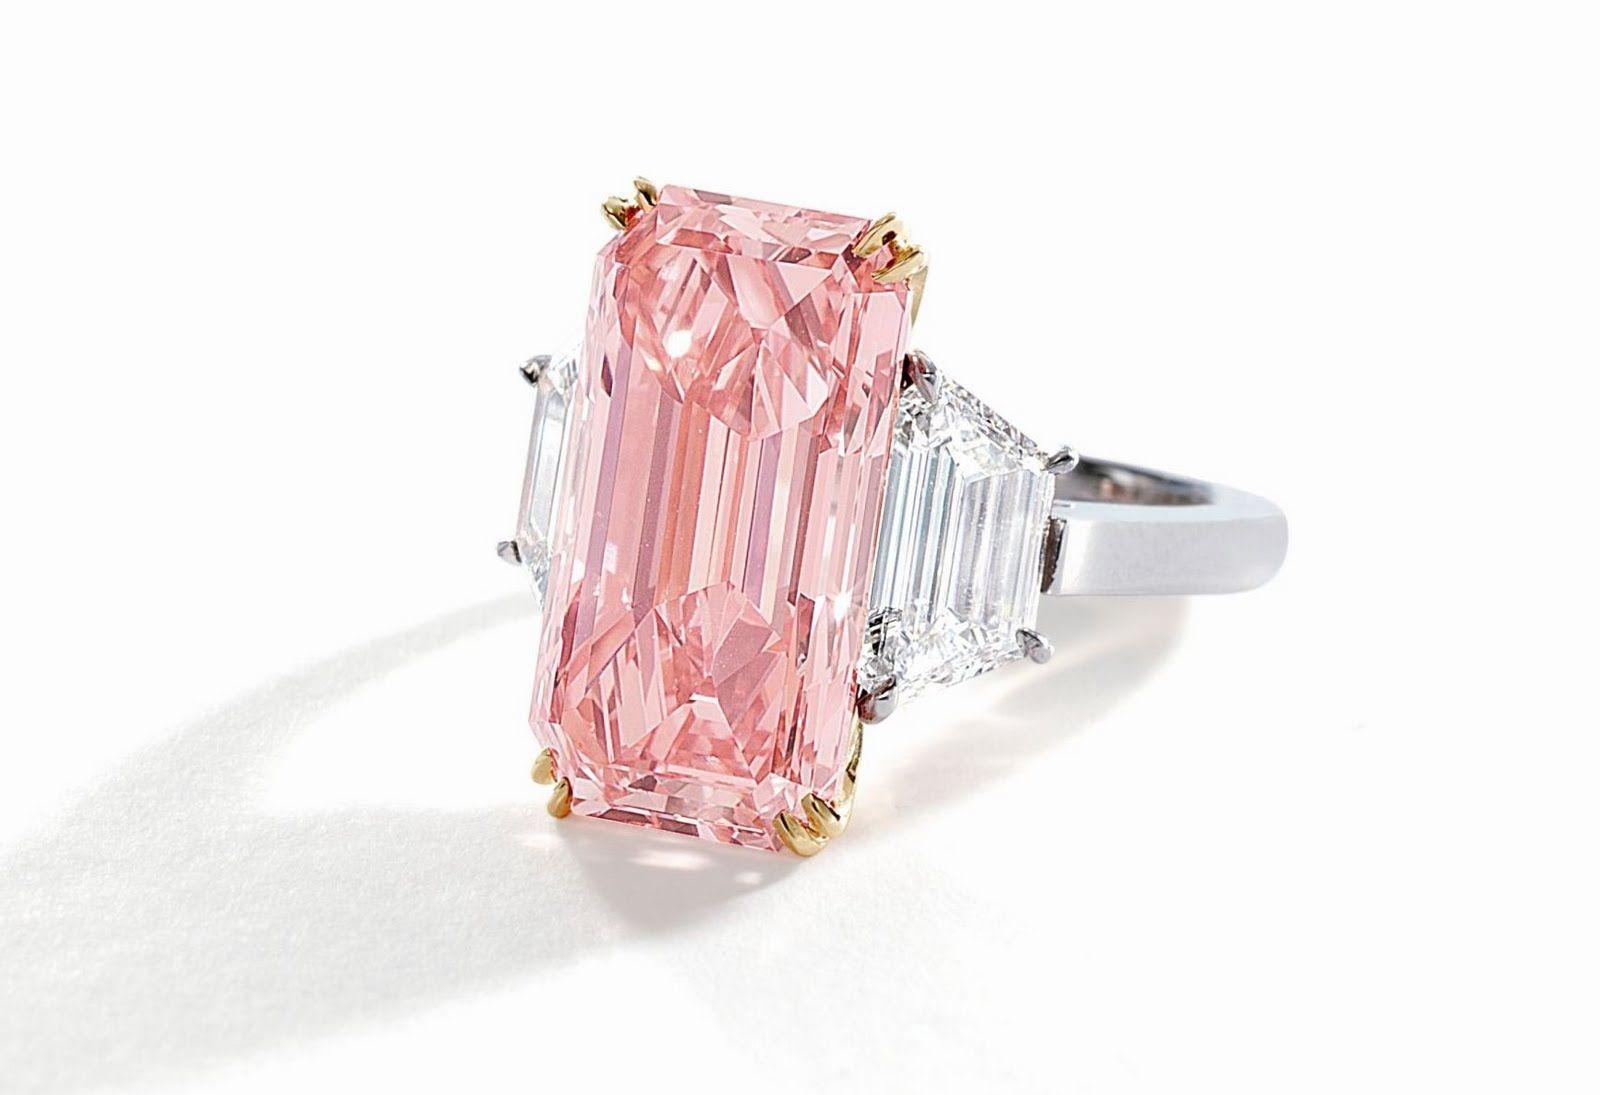 Golconda Pink\'\', an Important and Rare 9.27-Carat Fancy Vivid ...